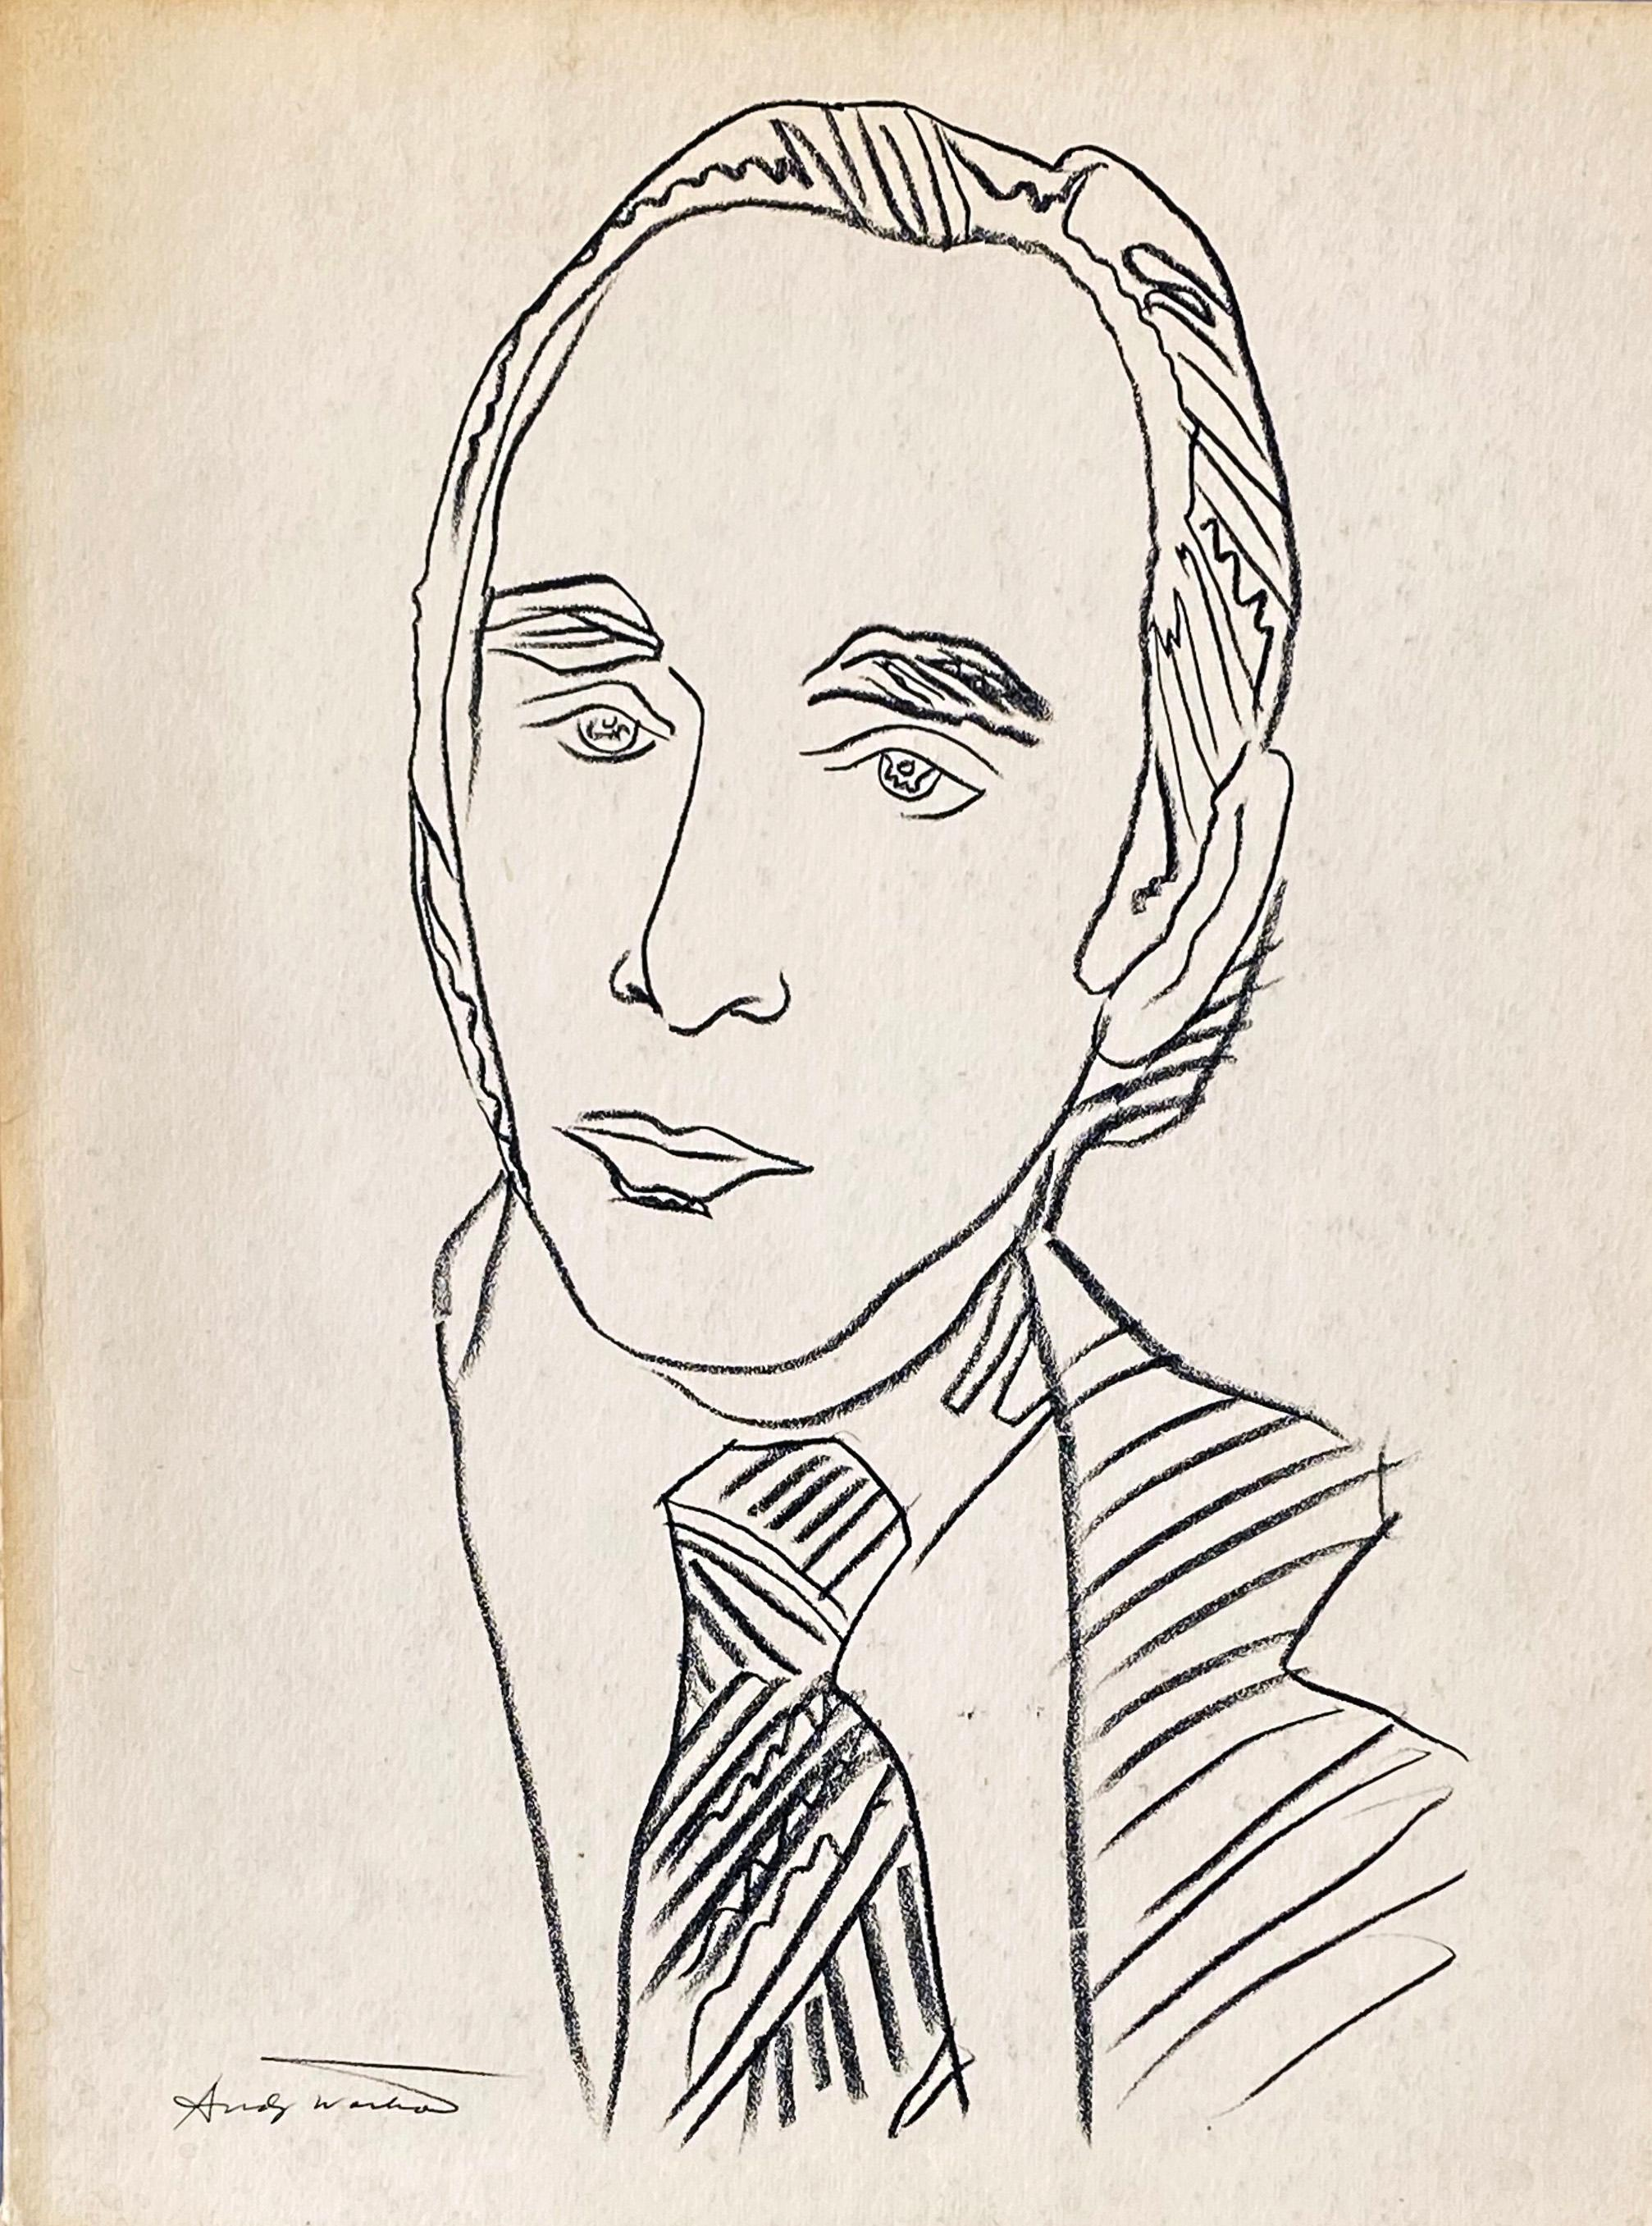 Warhol illustrated Leo Castelli Twenty Years book